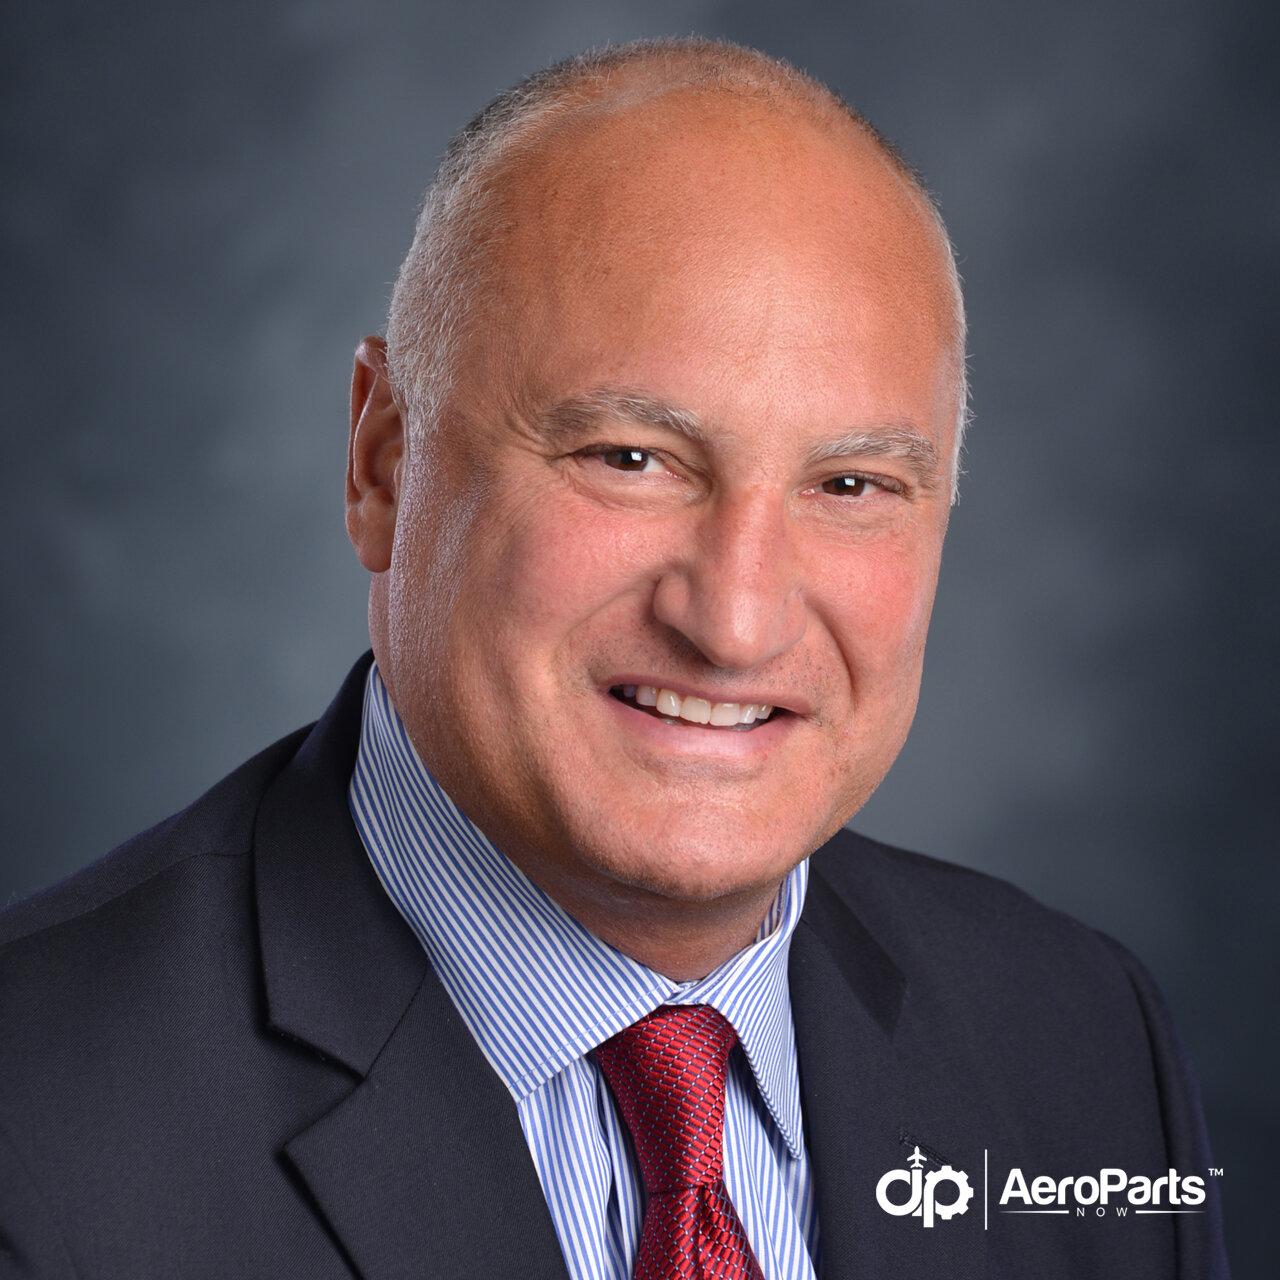 Mark Cumm, Vice President of Sales